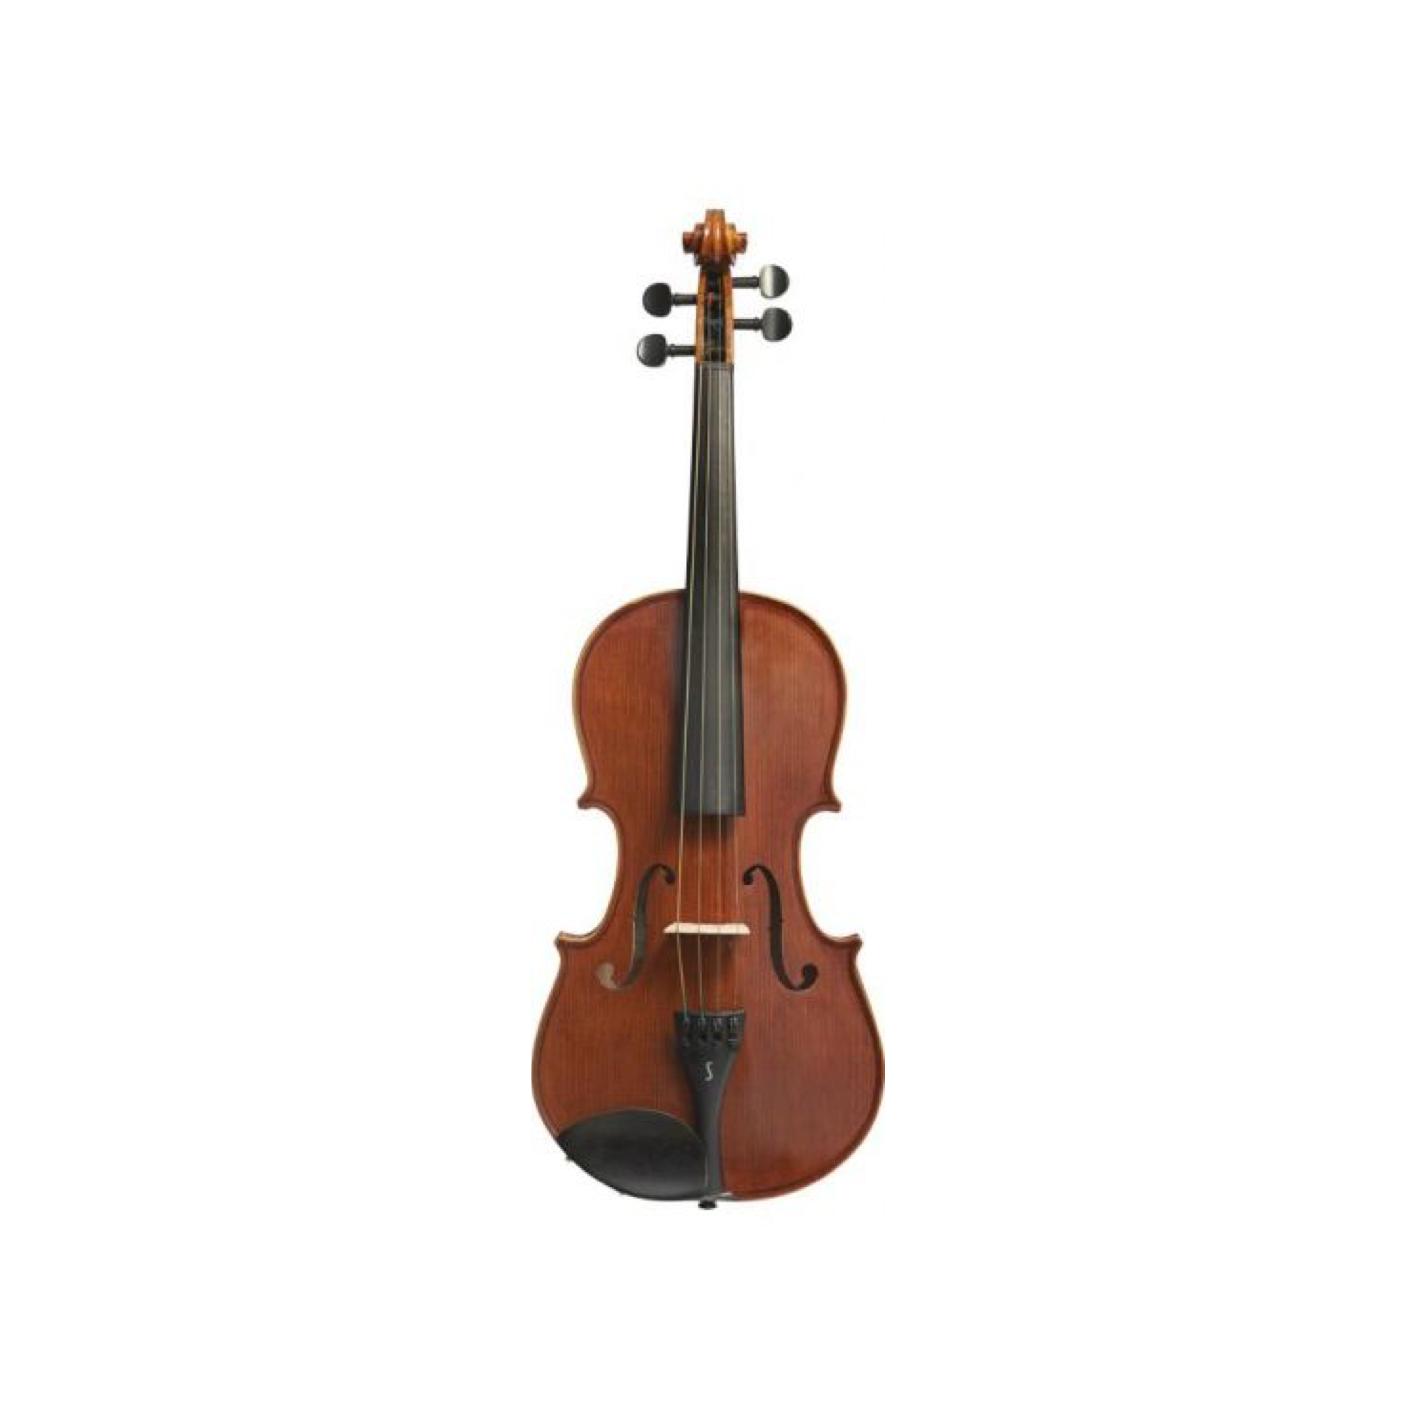 "Stentor Conservatoire 15.5"" Viola Outfit"